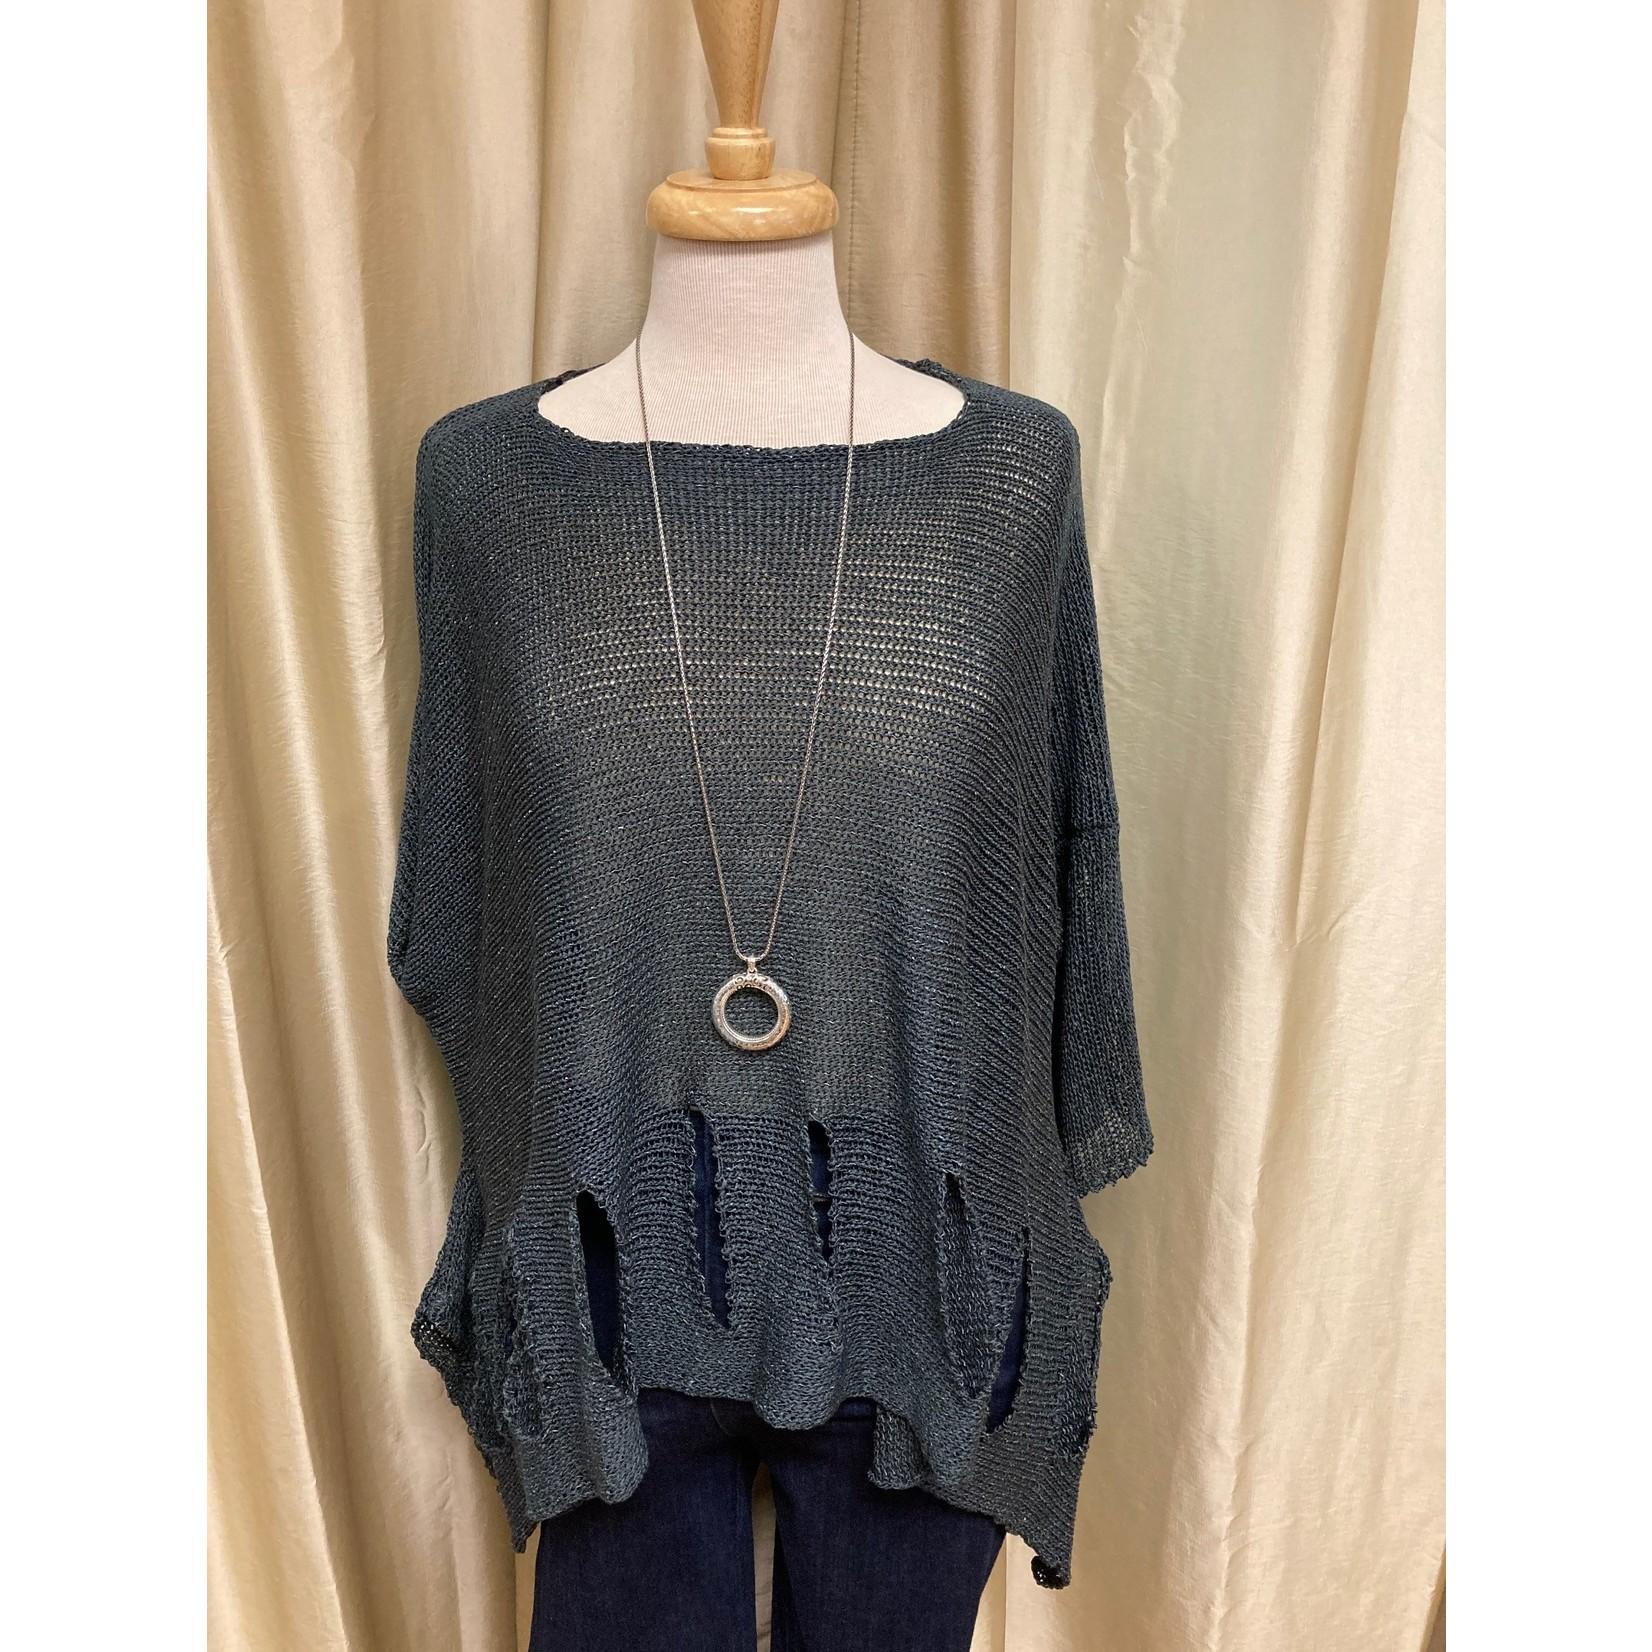 Holey Moley Sweater Fine Gauge  O/S Charcoal